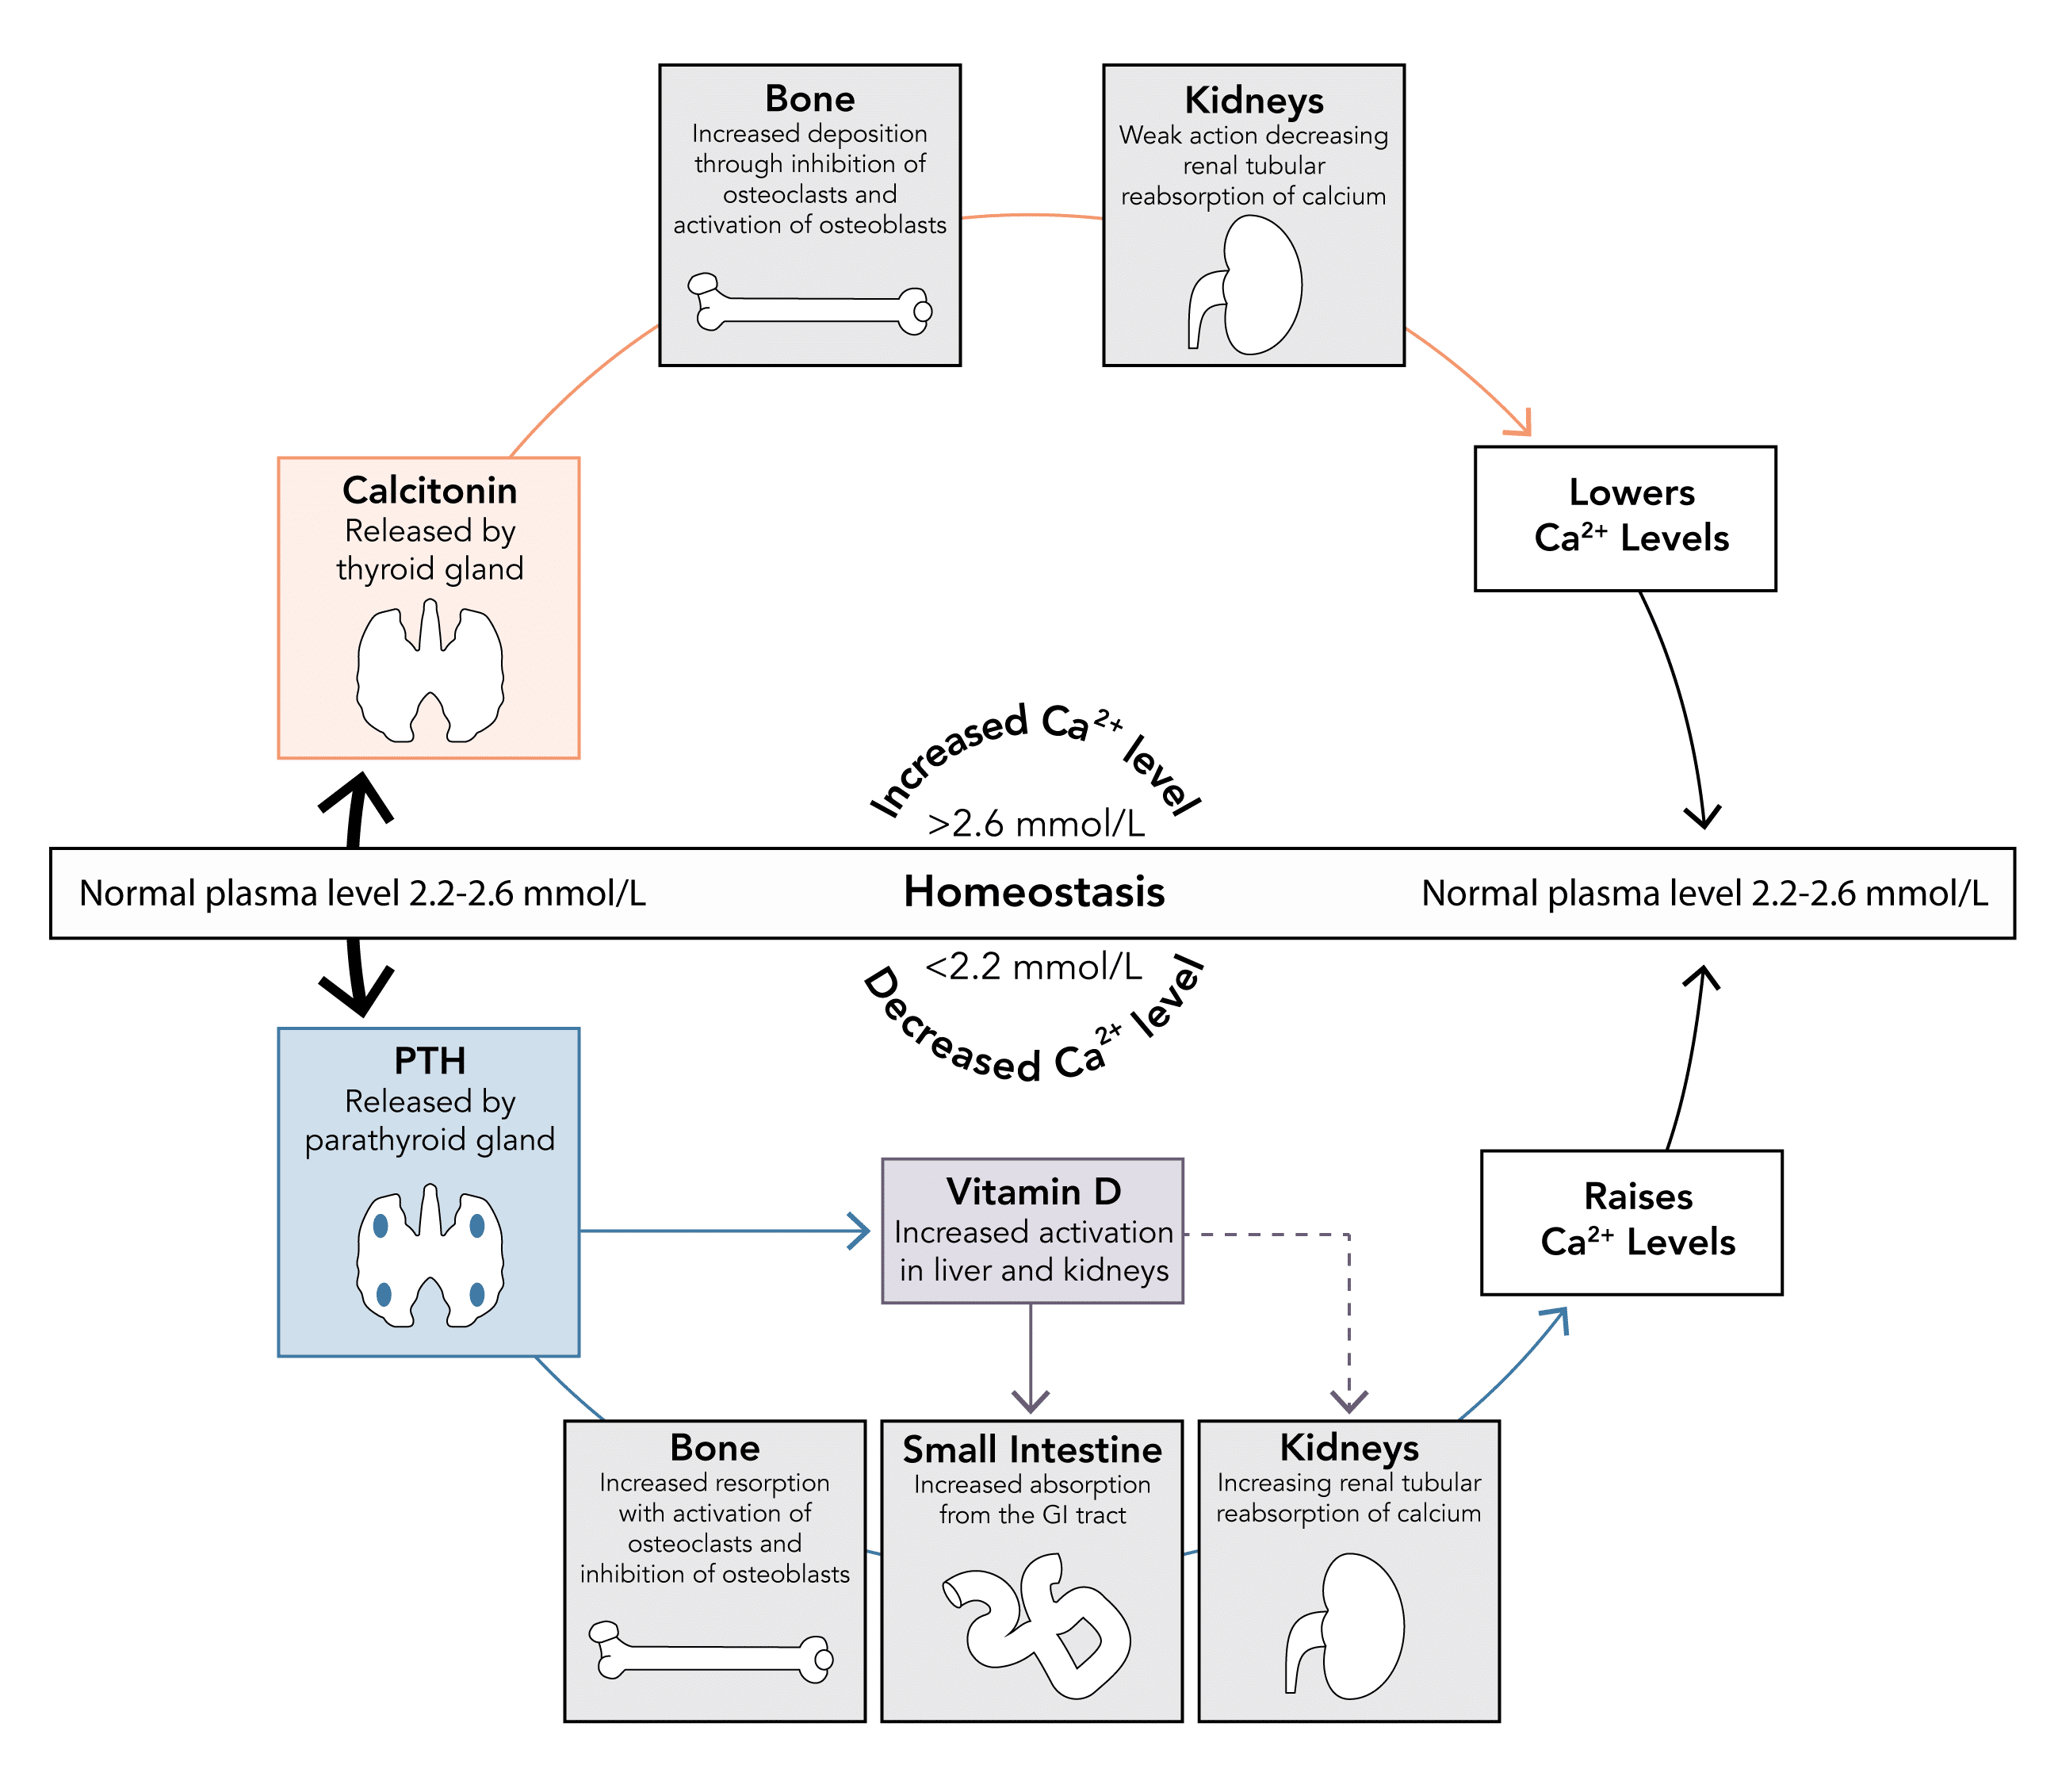 Calcium homeostasis - regulation of normal levels